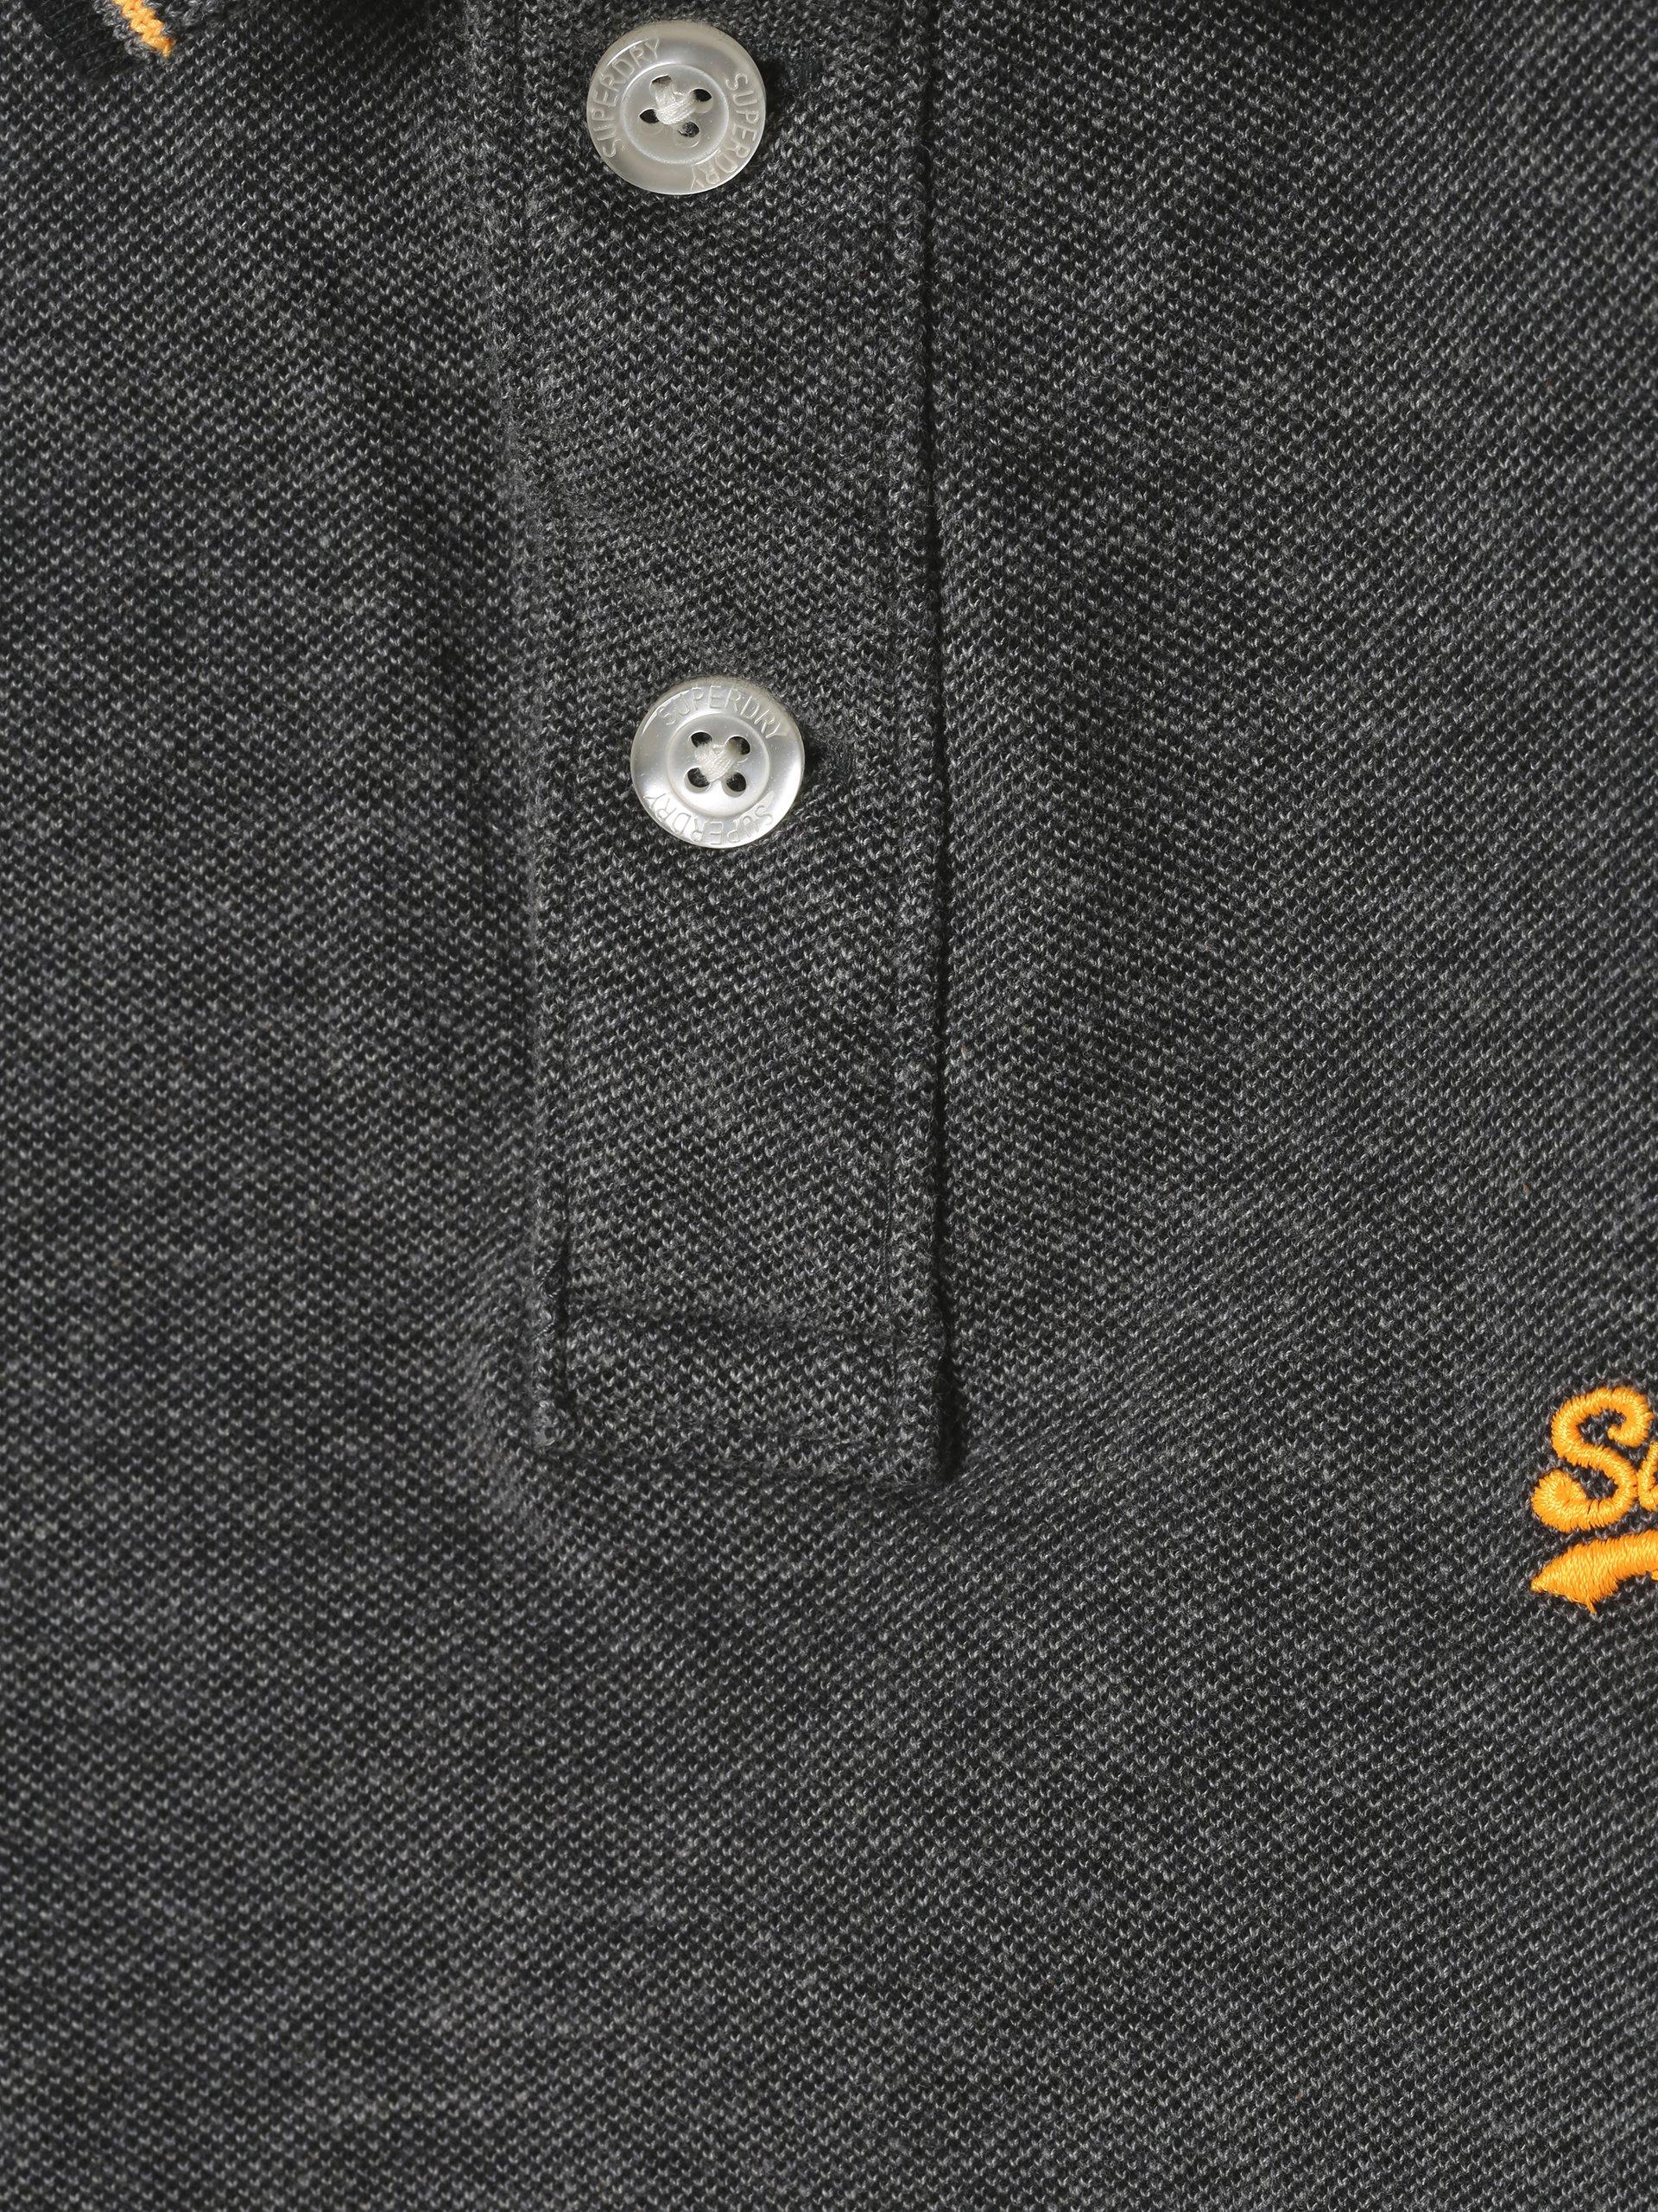 Superdry Herren Poloshirt